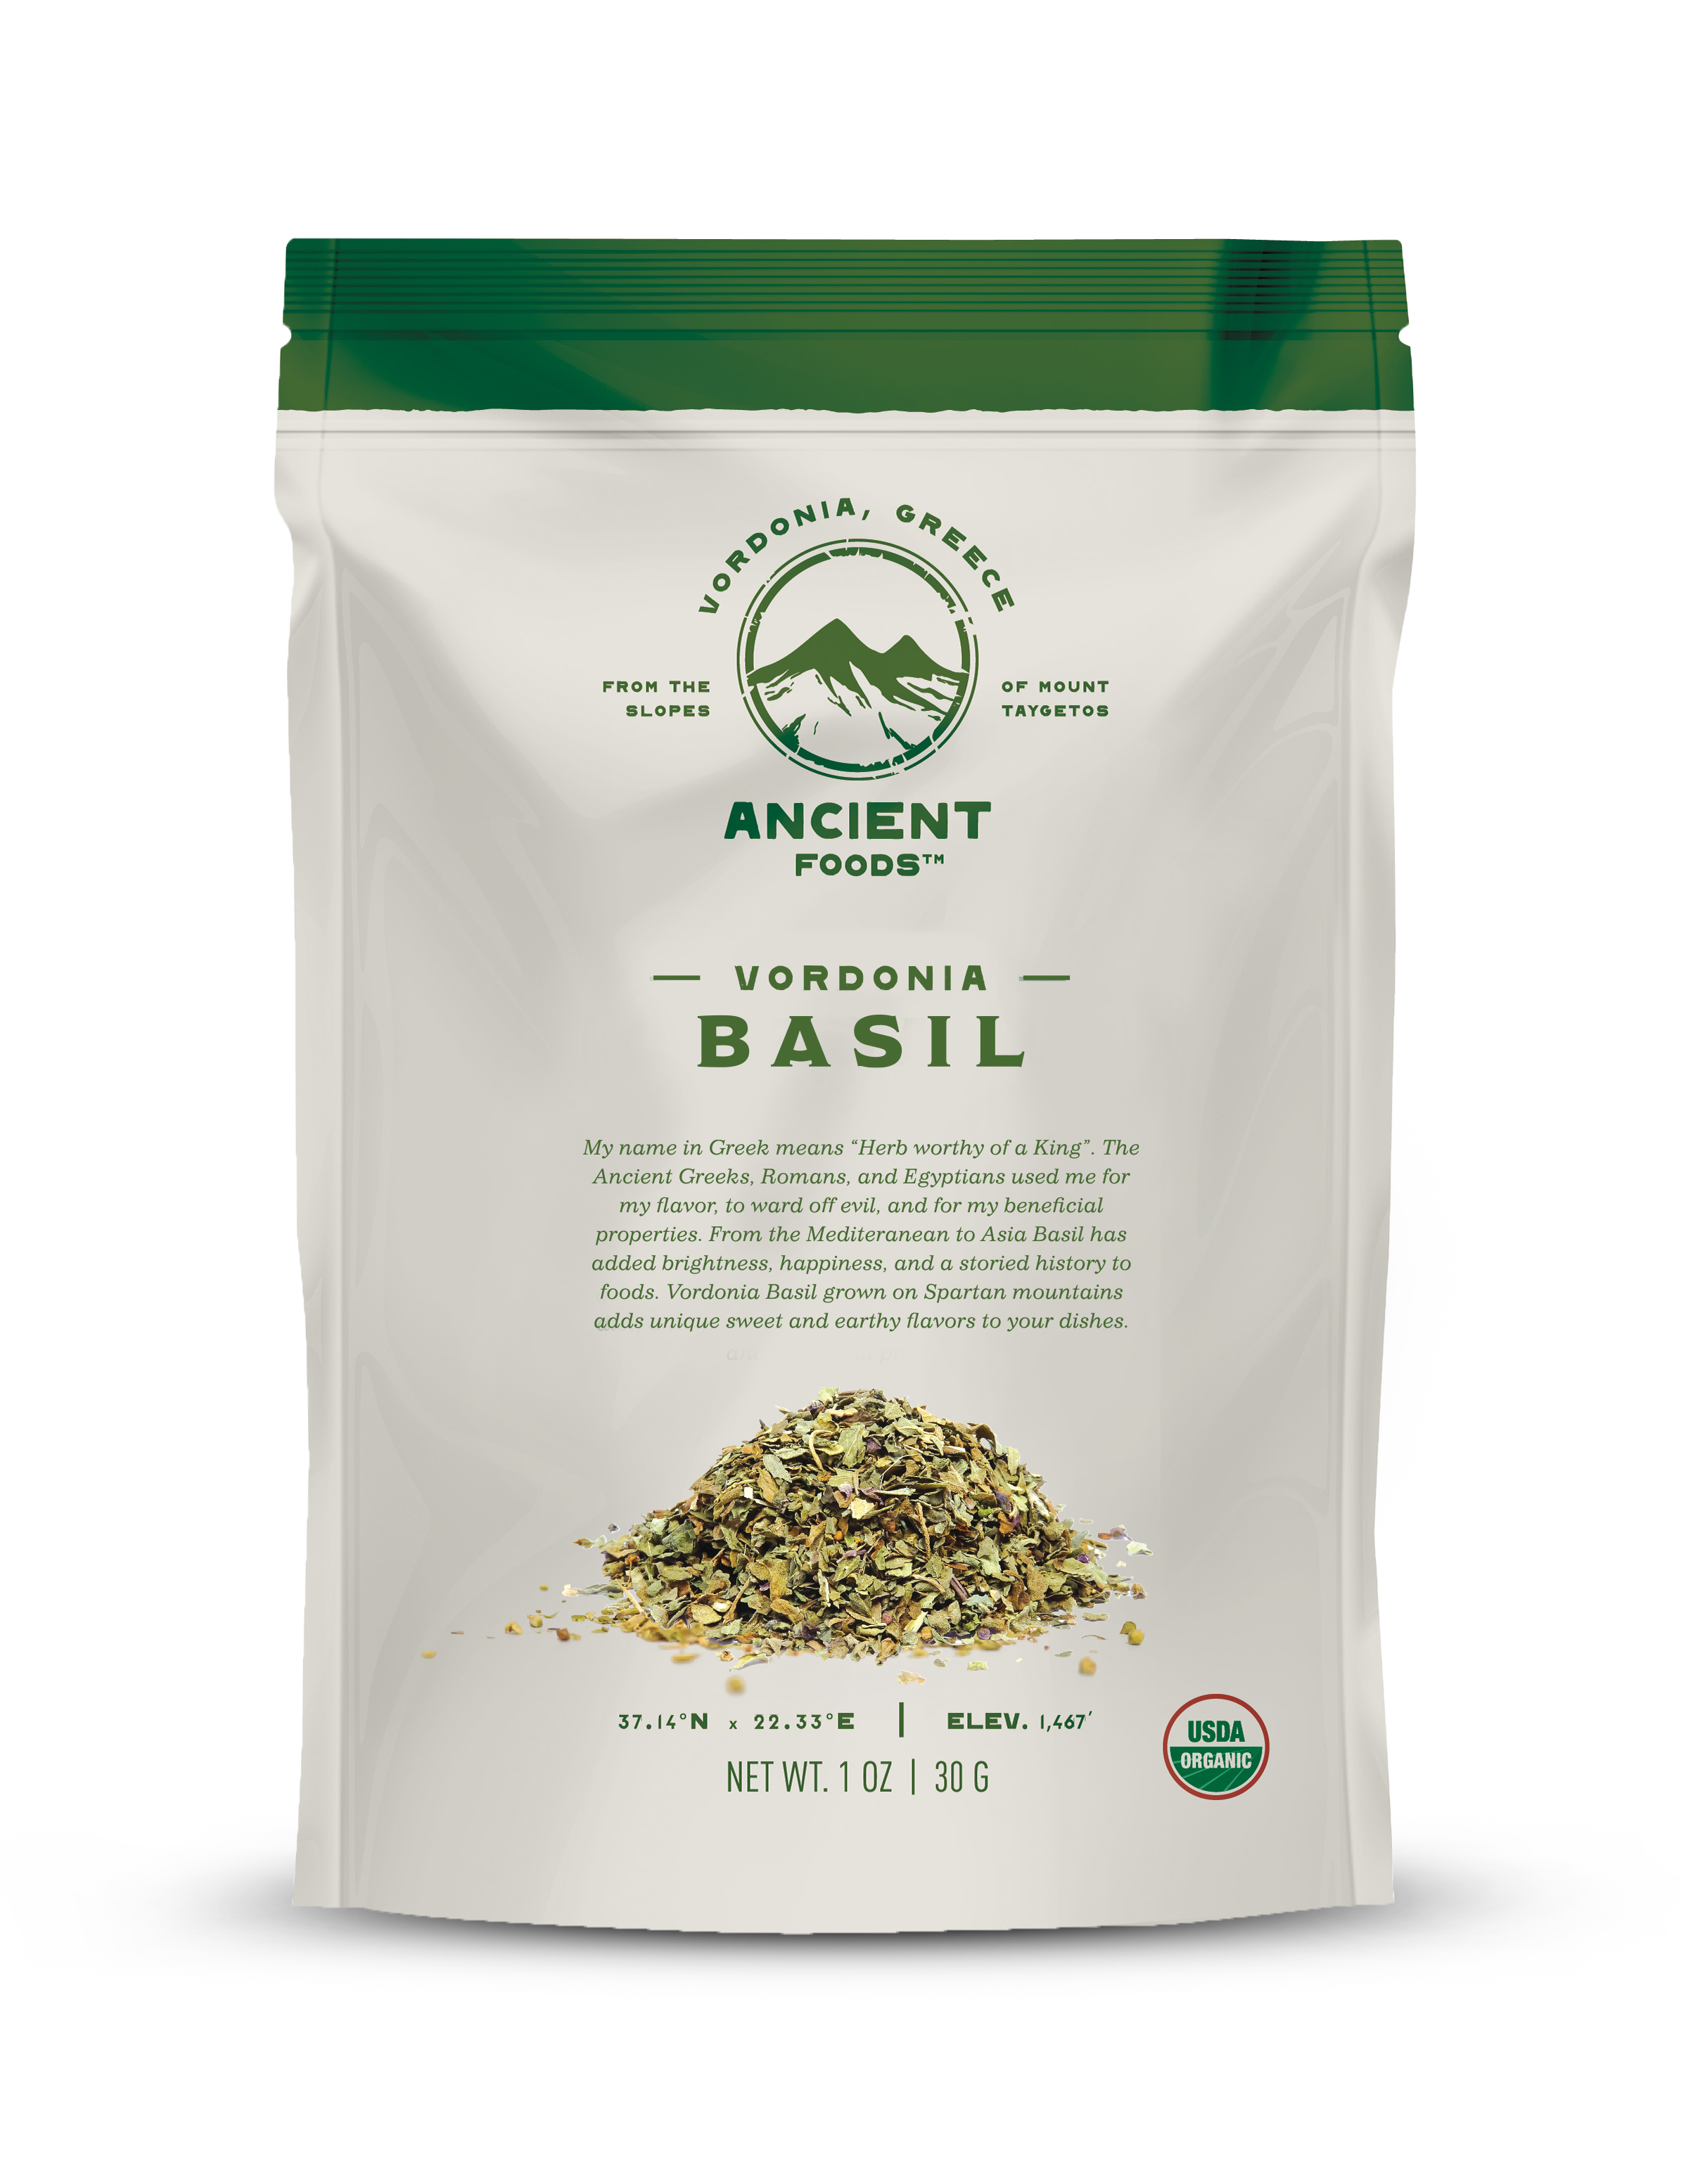 Organic Basil Herb, Vordonia Greece